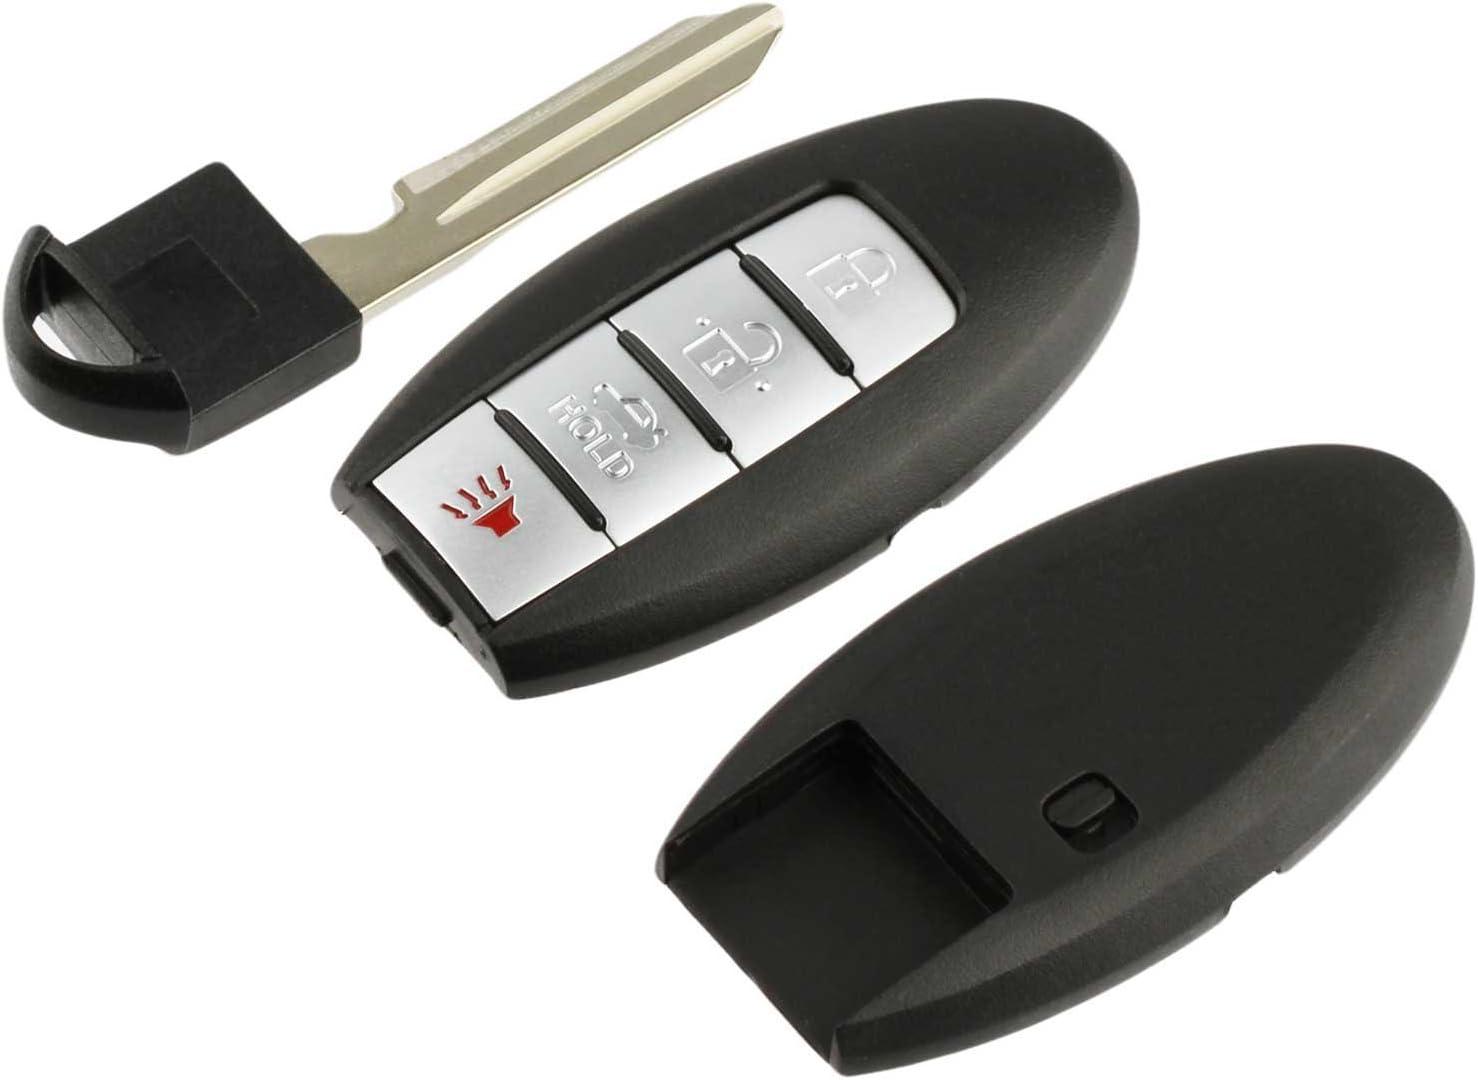 KeylessOption Keyless Entry Remote Smart Car Key Fob Shell Case Cover Valet Insert Blade For Nissan KR55WK49622